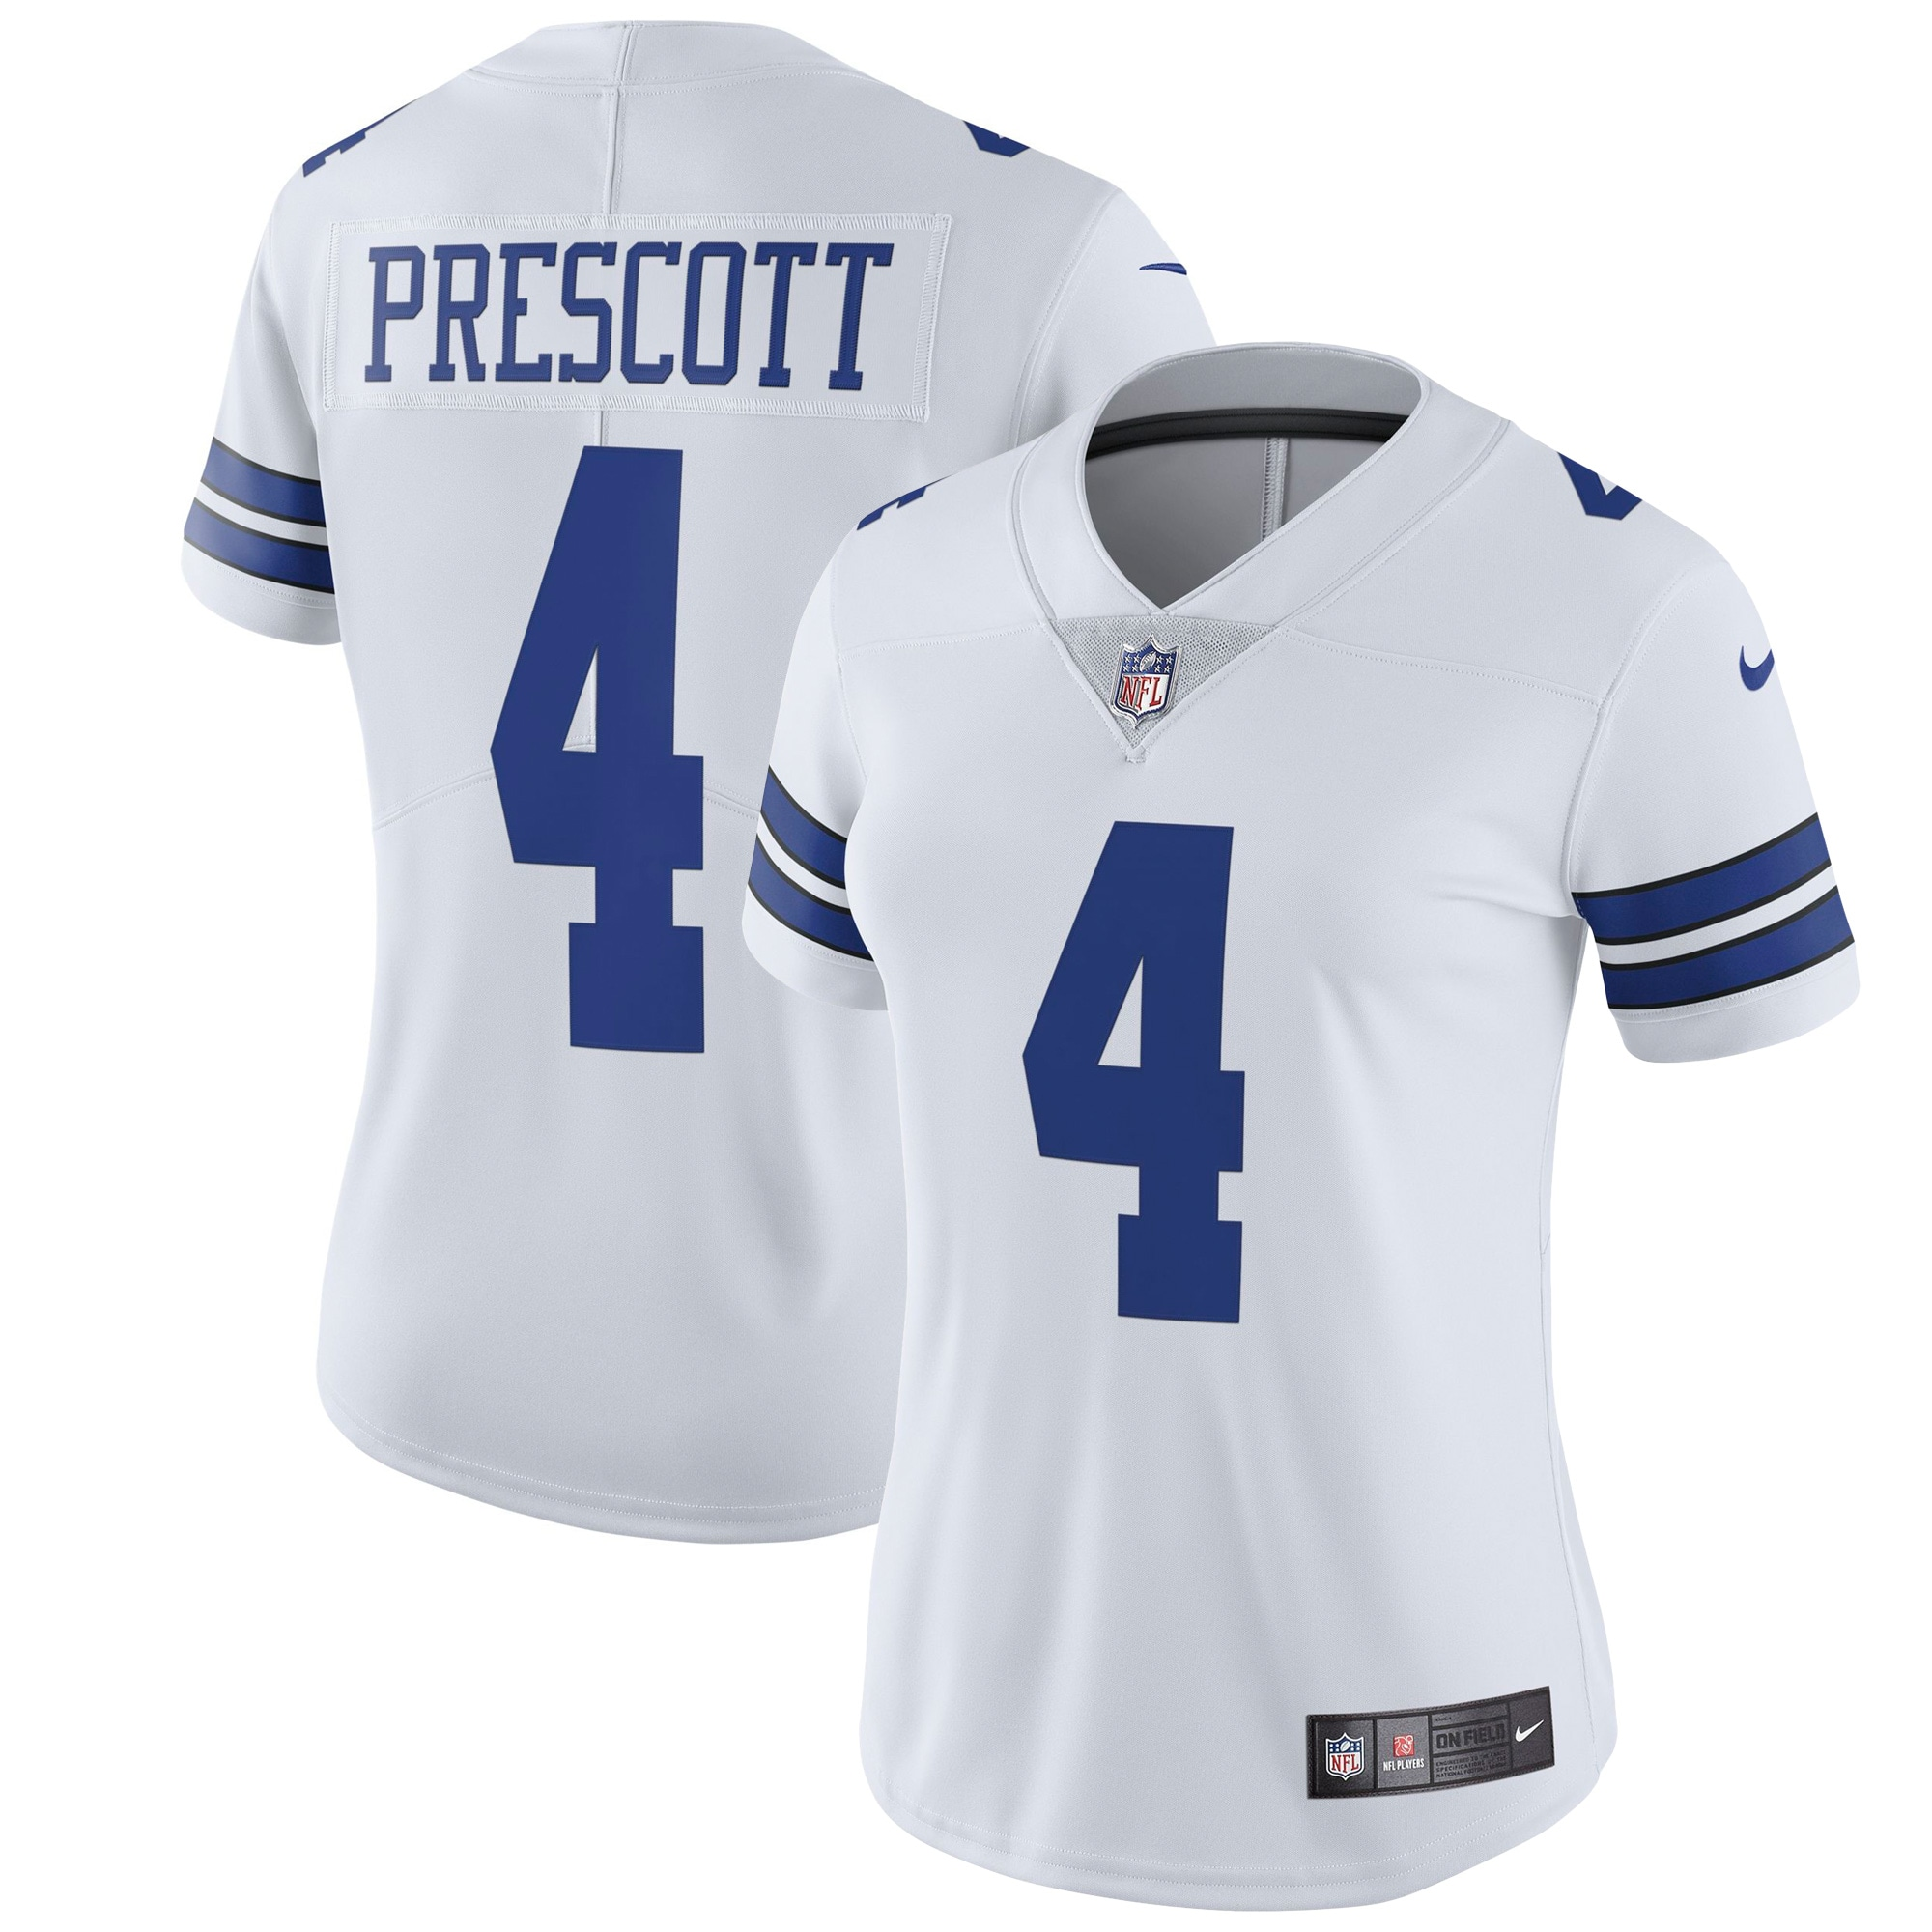 Dak Prescott Dallas Cowboys Nike Women's Vapor Untouchable Limited Jersey - White